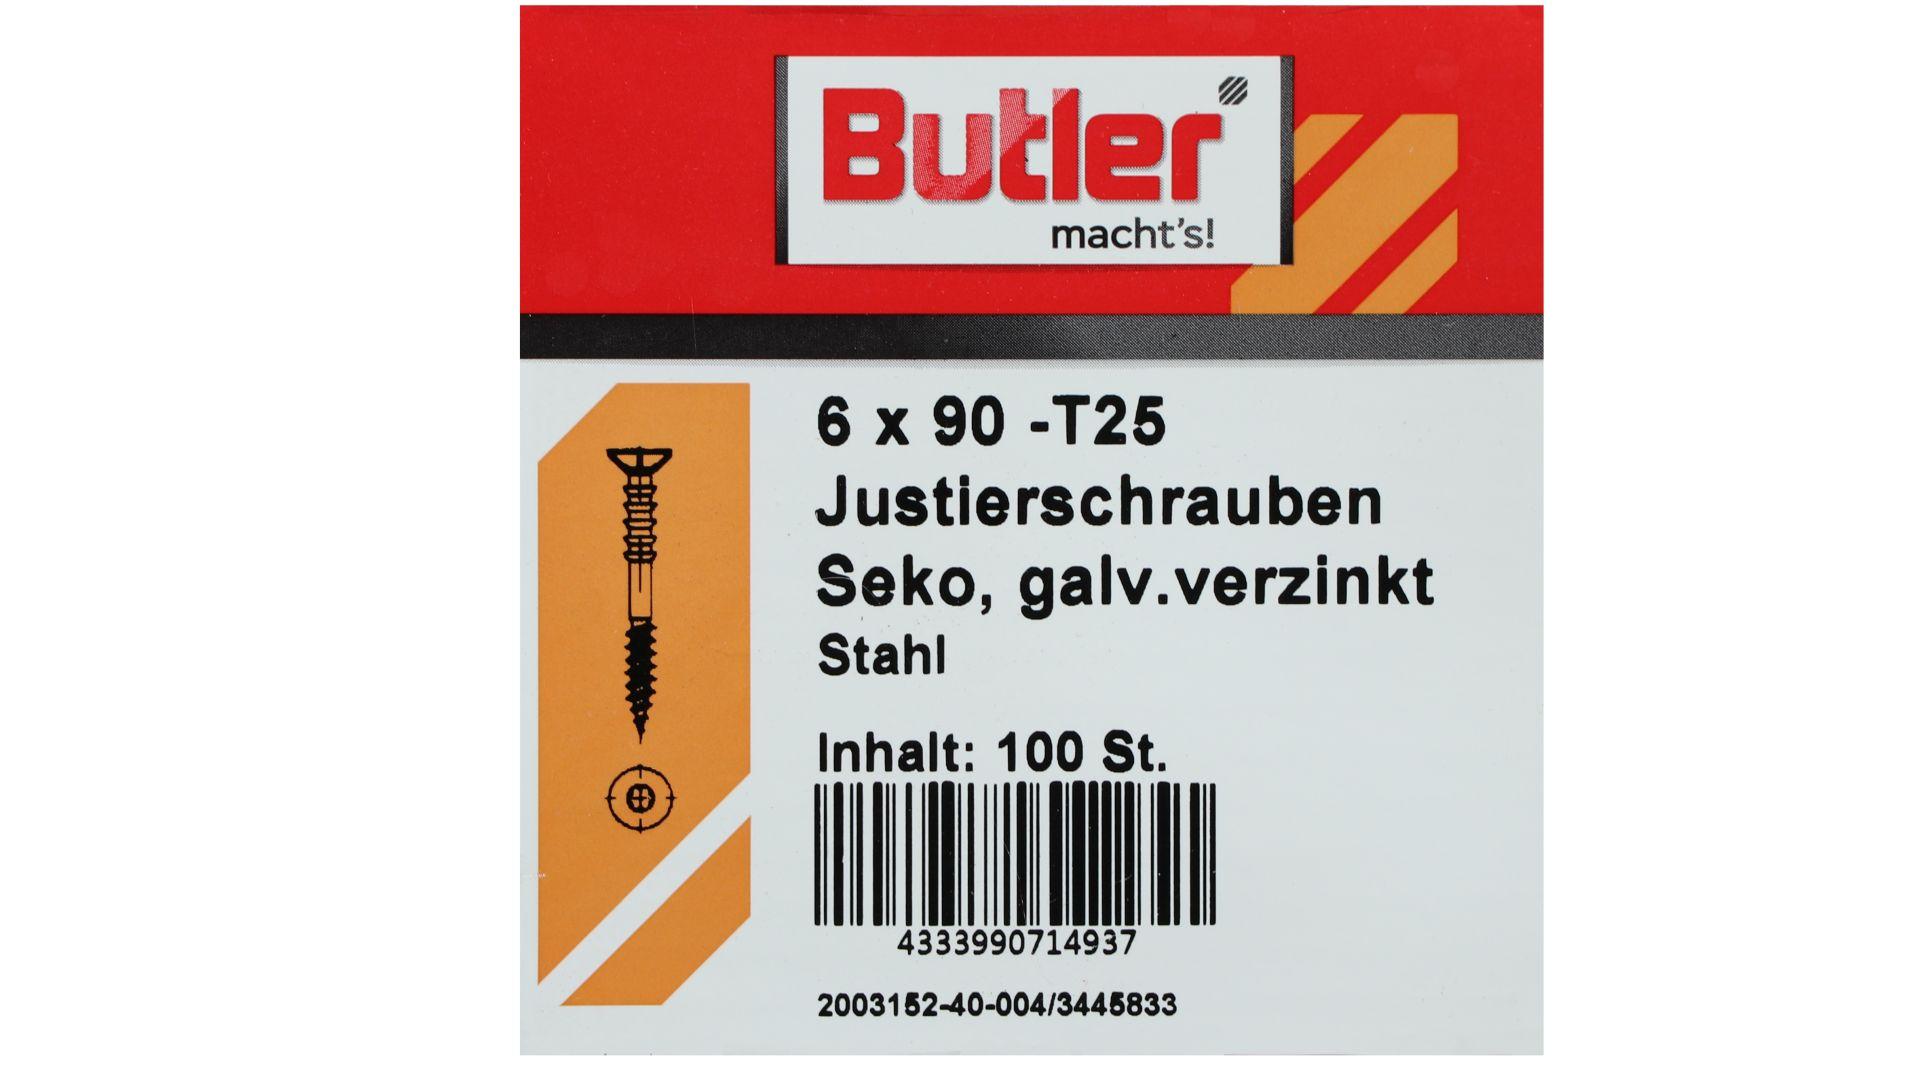 Butler macht's! Justierschraube, Stahl, Senkkopf, galvanisch verzinkt, T25, 6 x 90 mm, 100 Stück